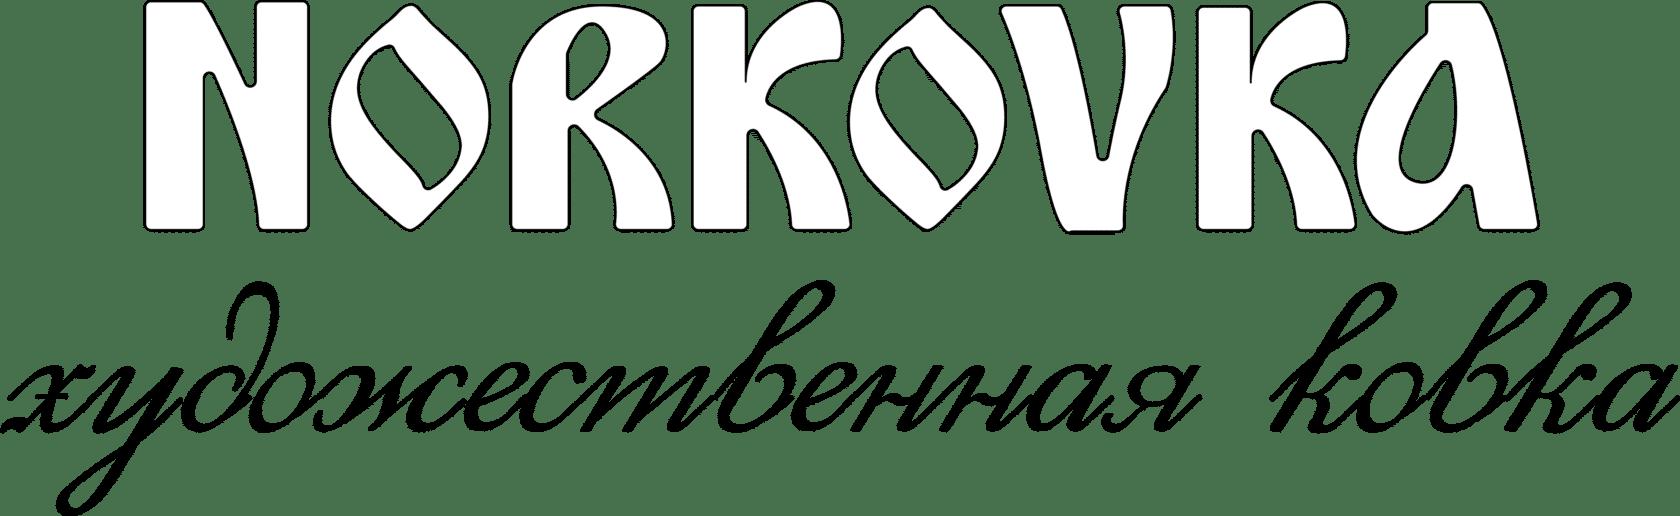 Кованые балконы Элитный кованый балкон Арт. Б-007 Norkovka